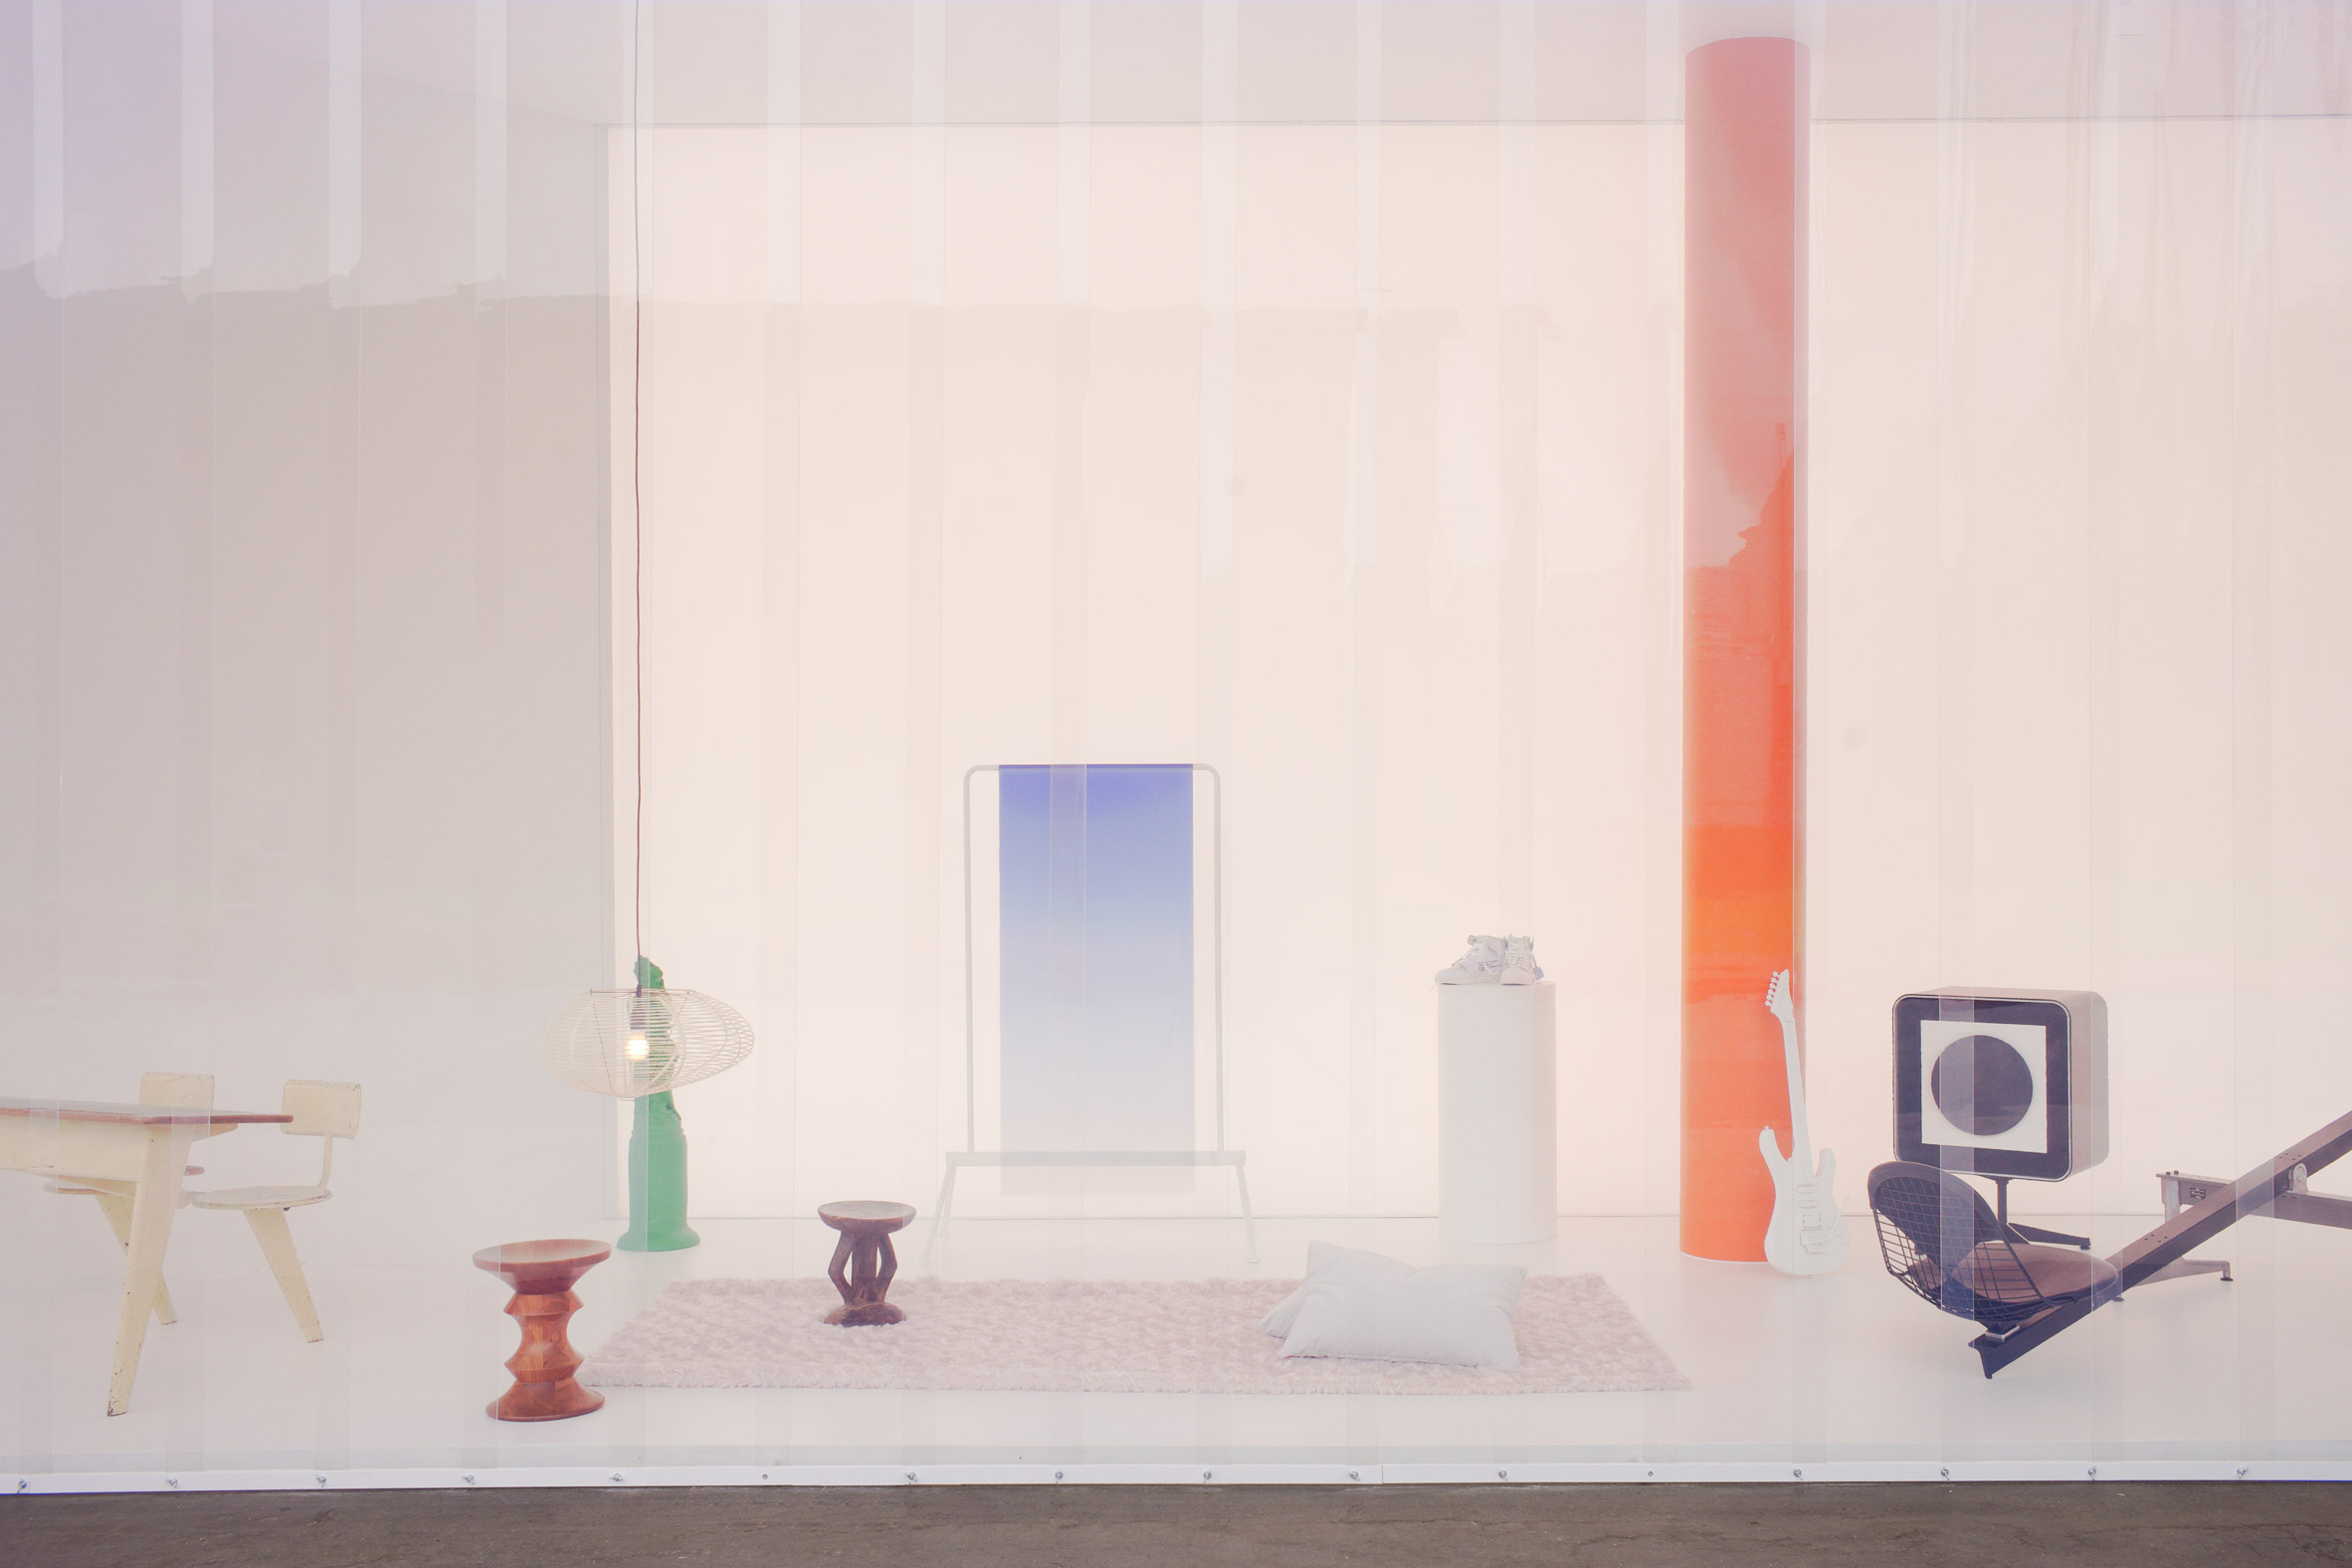 vitra-virgil-abloh-house-future-2035_dezeen_2364_col_3.jpg